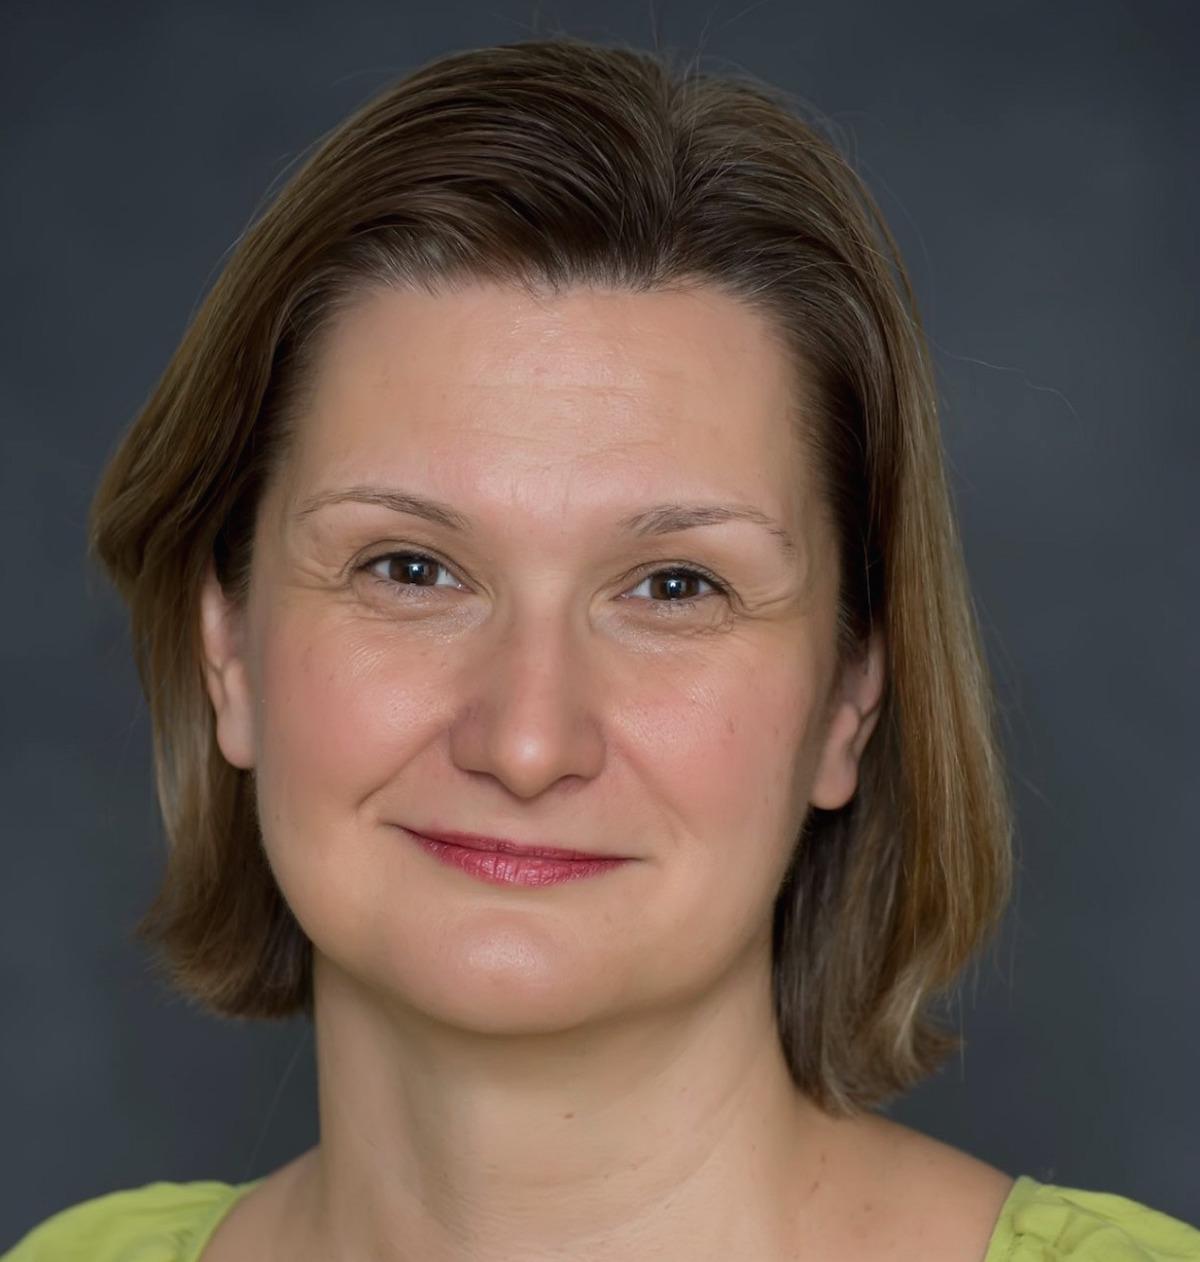 Kateryna Schray